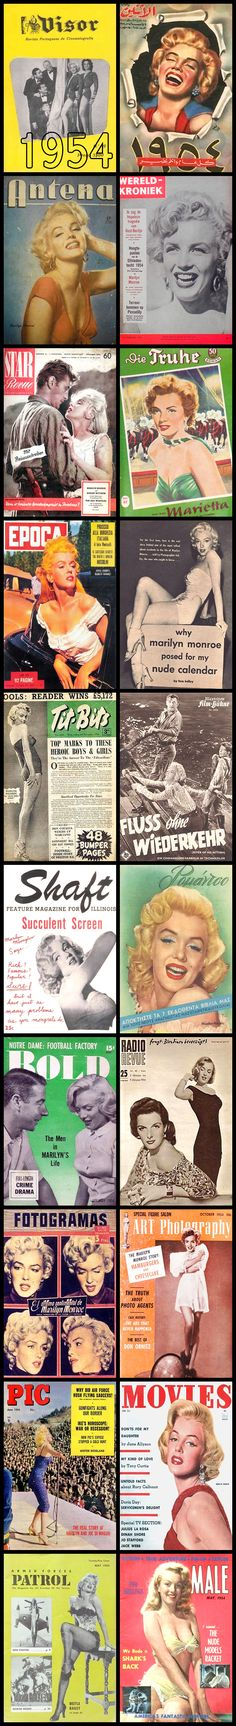 1954 magazine covers of Marilyn Monroe .... #normajeane #vintagemagazine #pinup #iconic #raremagazine #magazinecover #hollywoodactress #monroe #marilyn #1950s